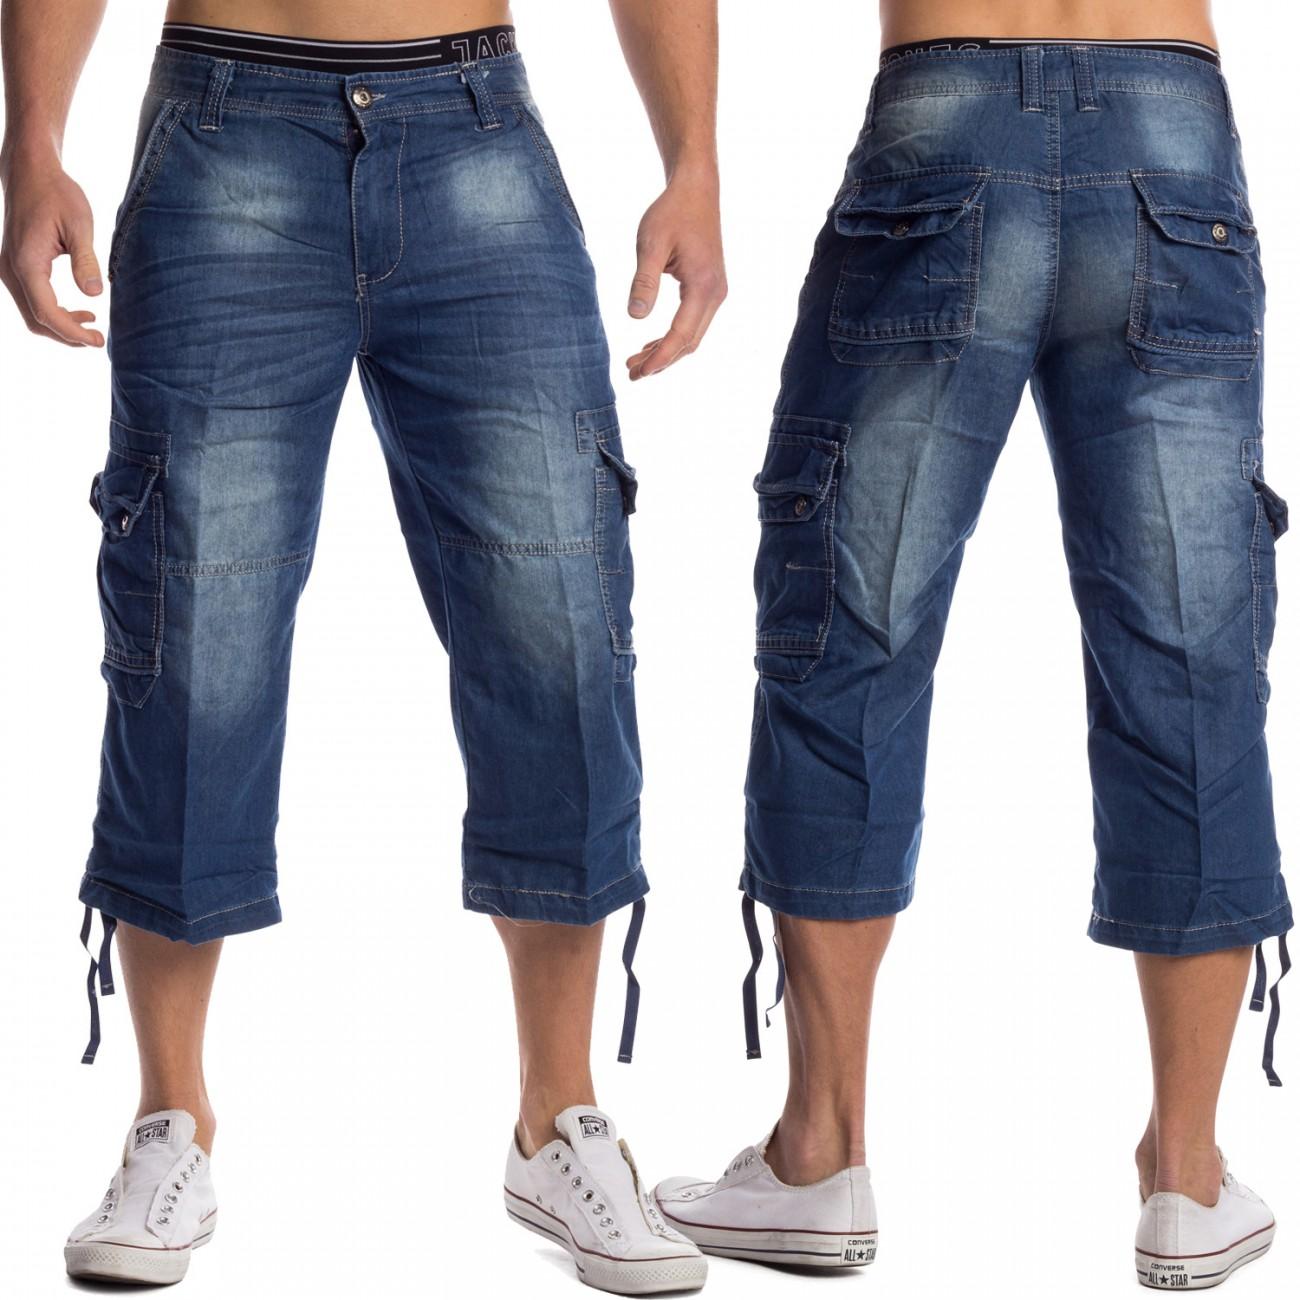 herren jeans shorts kurz 3 4 hose bermuda denim stone washed hellblau jeansshort ebay. Black Bedroom Furniture Sets. Home Design Ideas